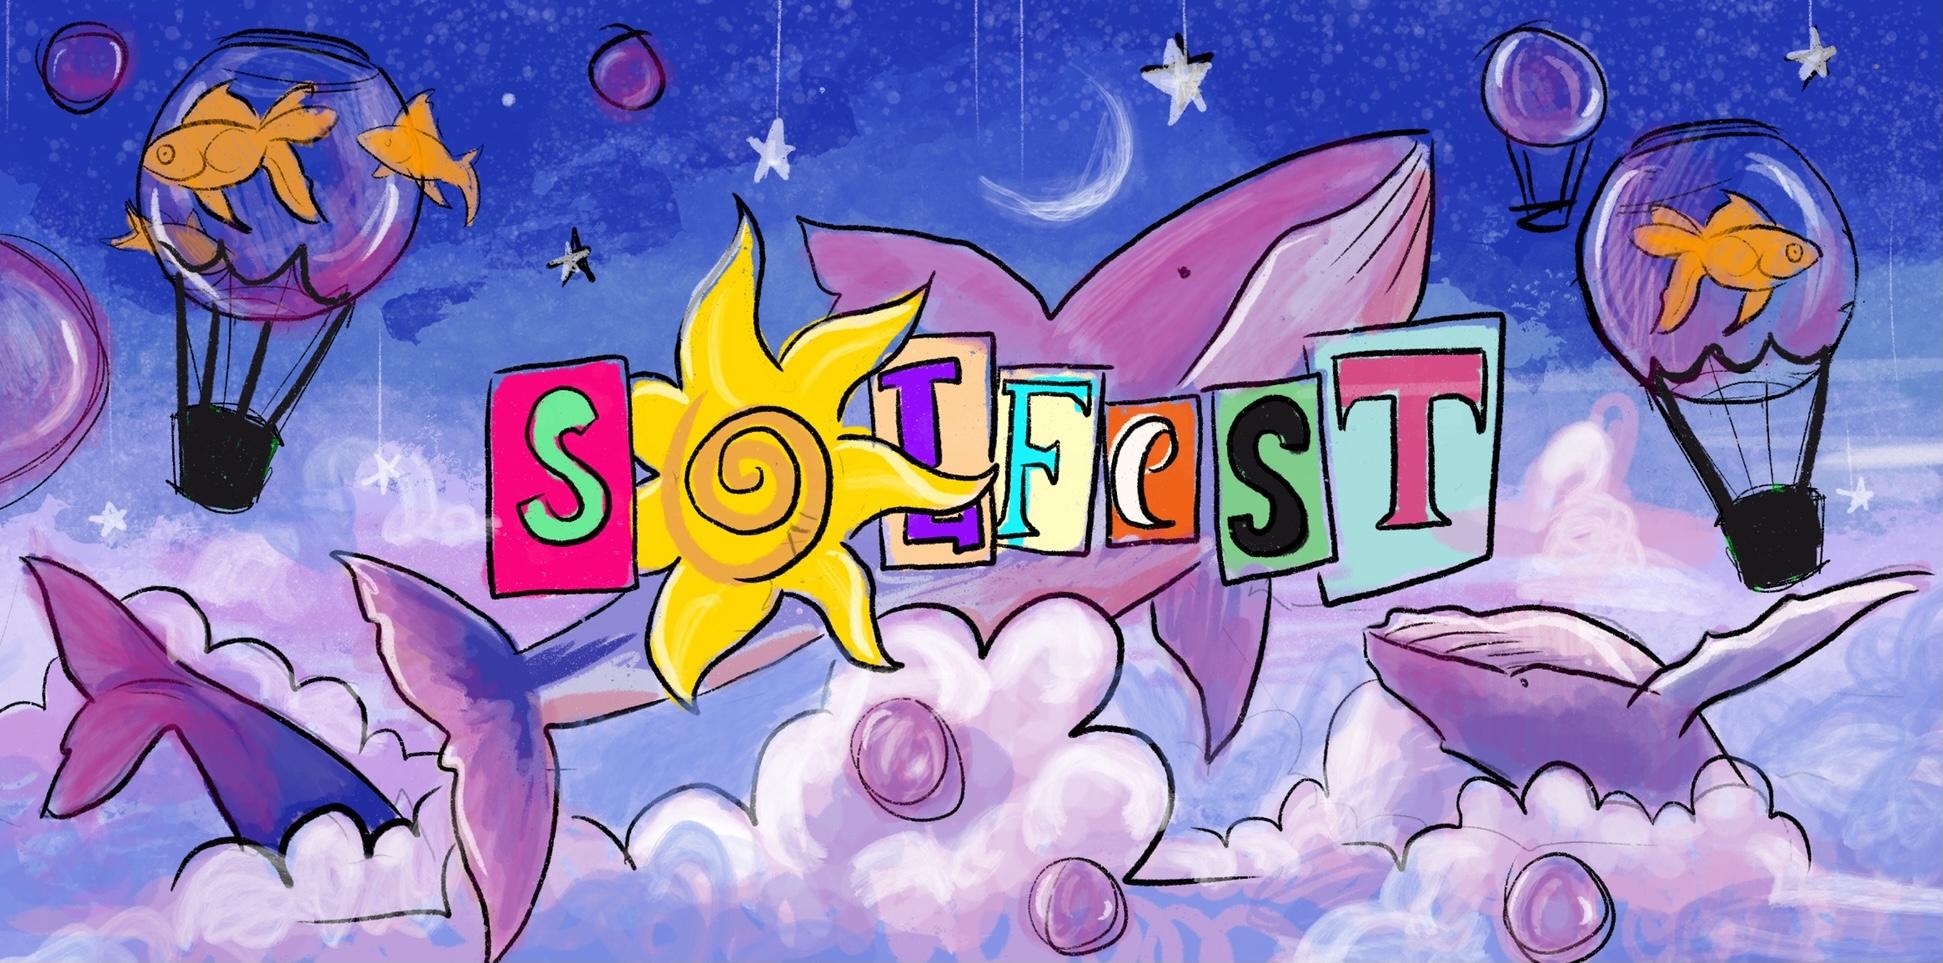 Illustration, solfest, arts, graduate, festival, collaboration, mural, painting, canada